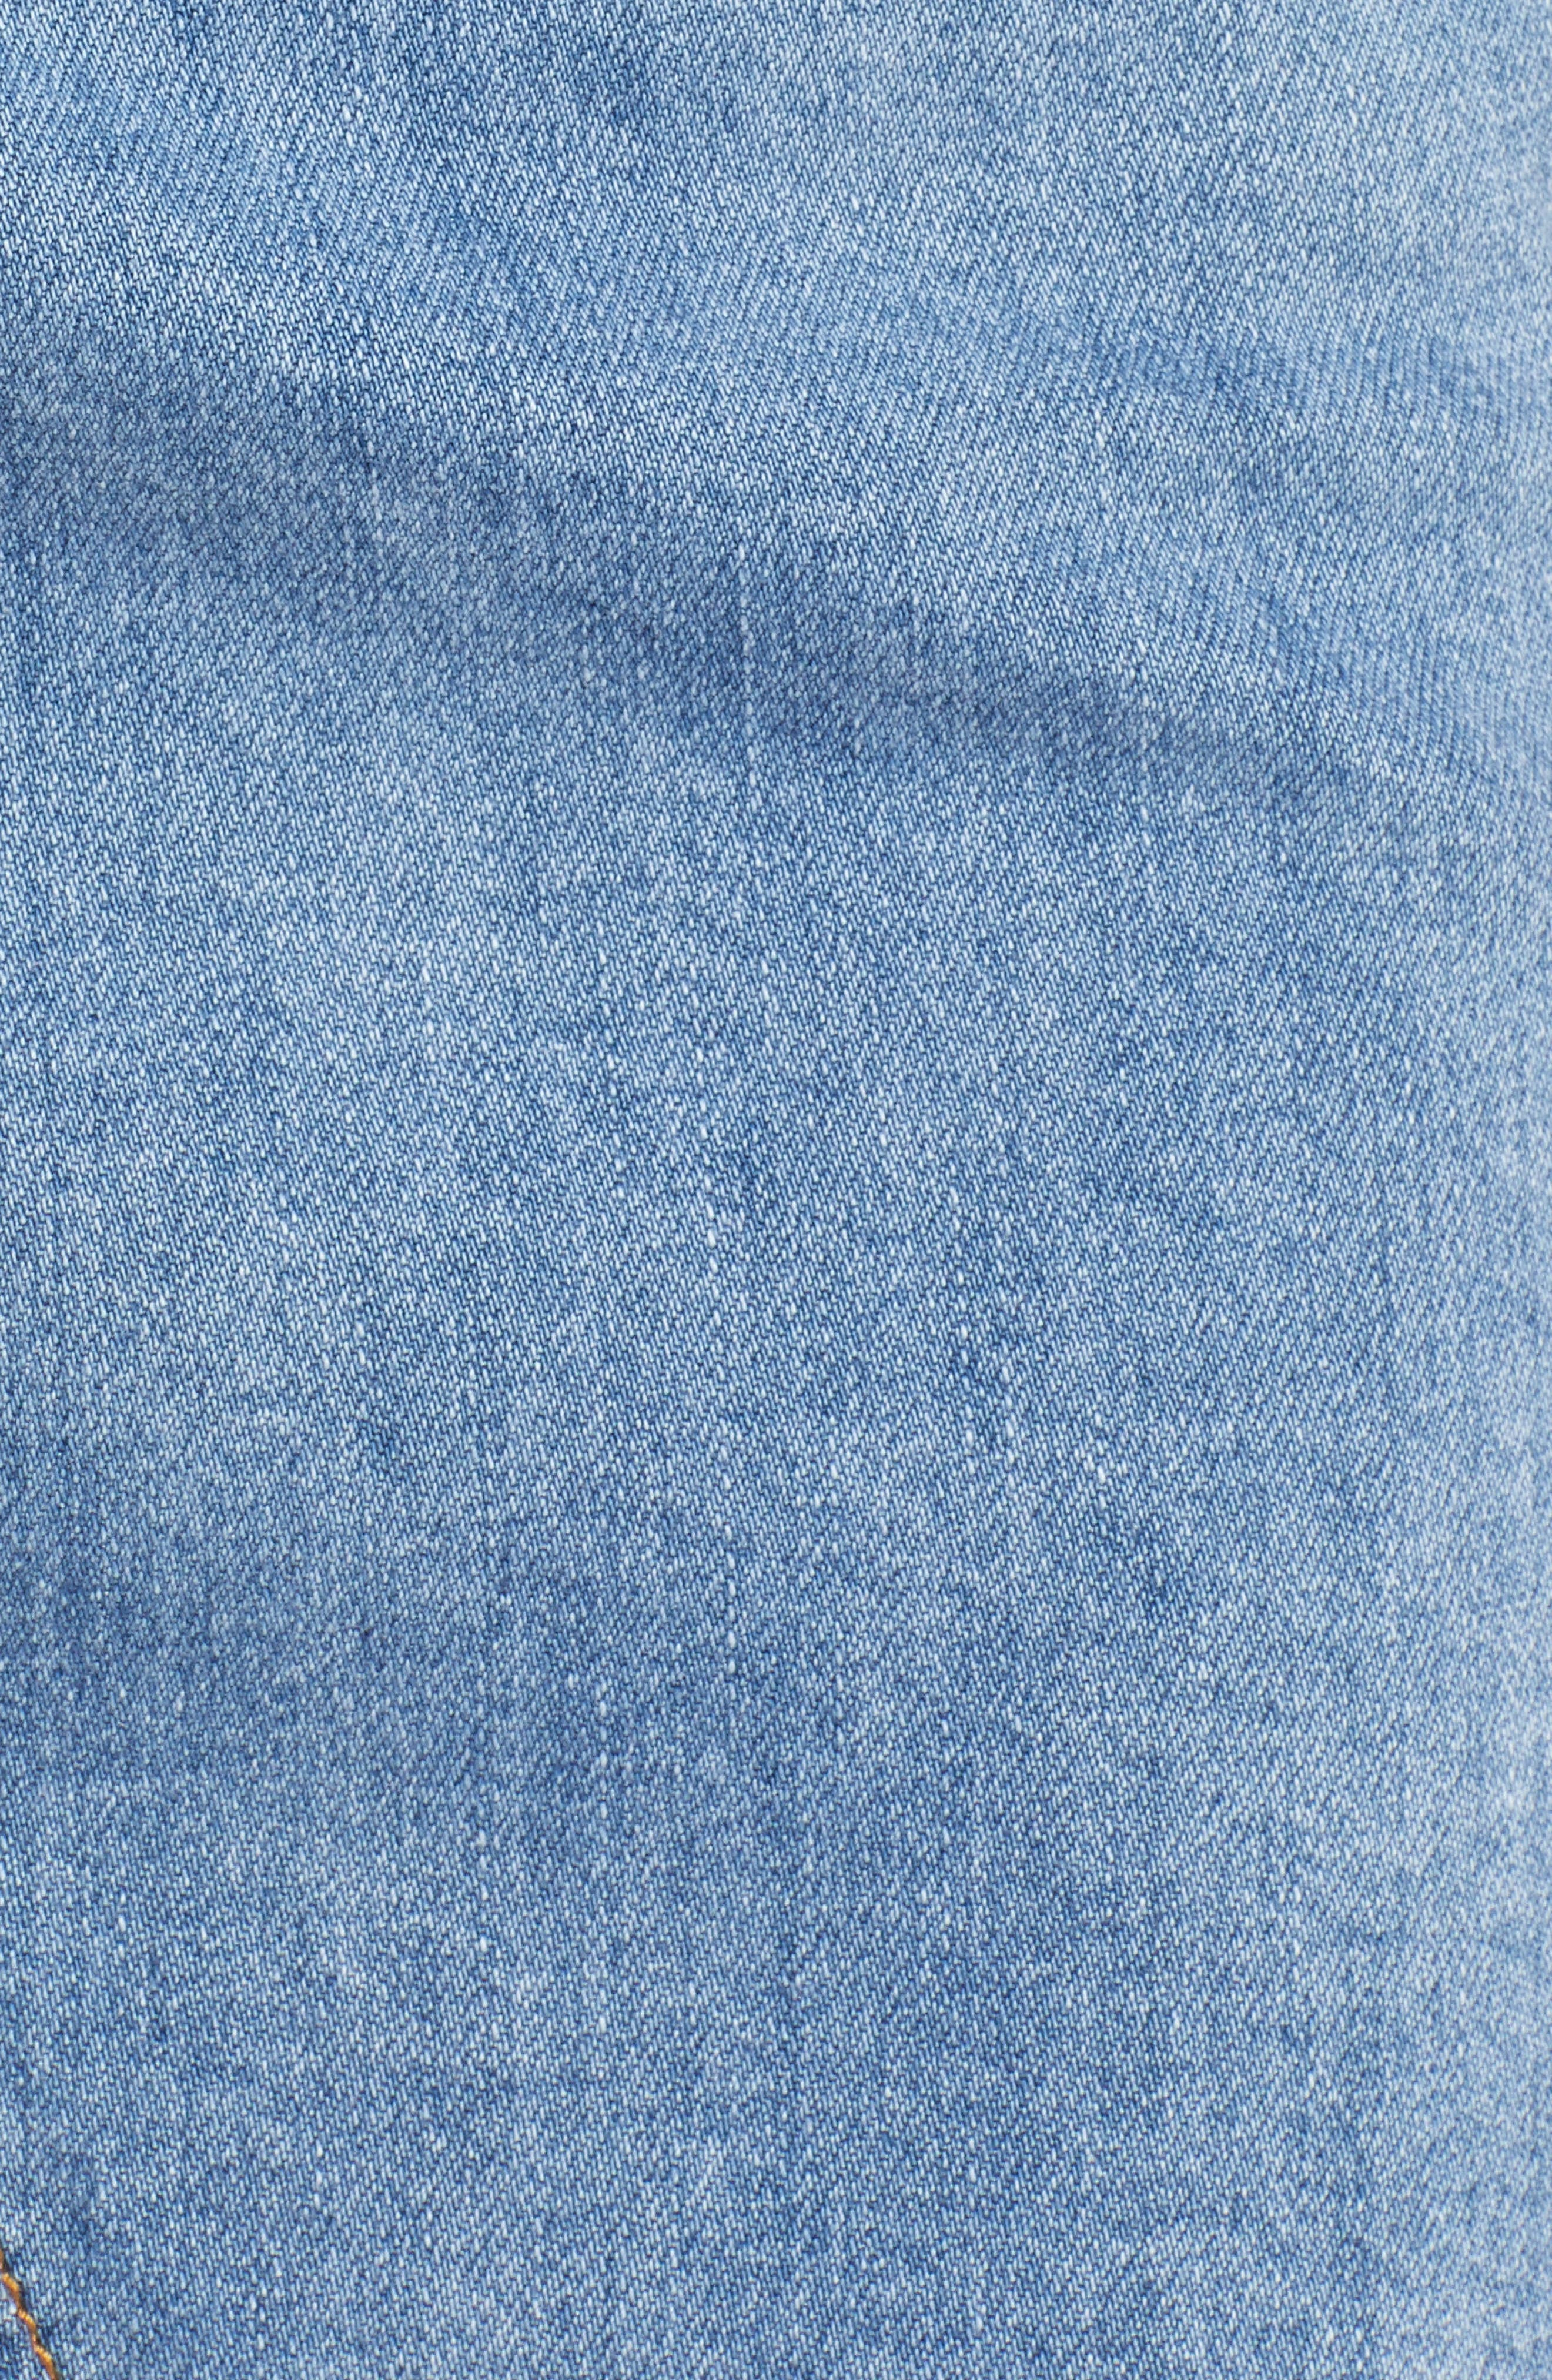 Distressed Denim Skirt,                             Alternate thumbnail 6, color,                             400